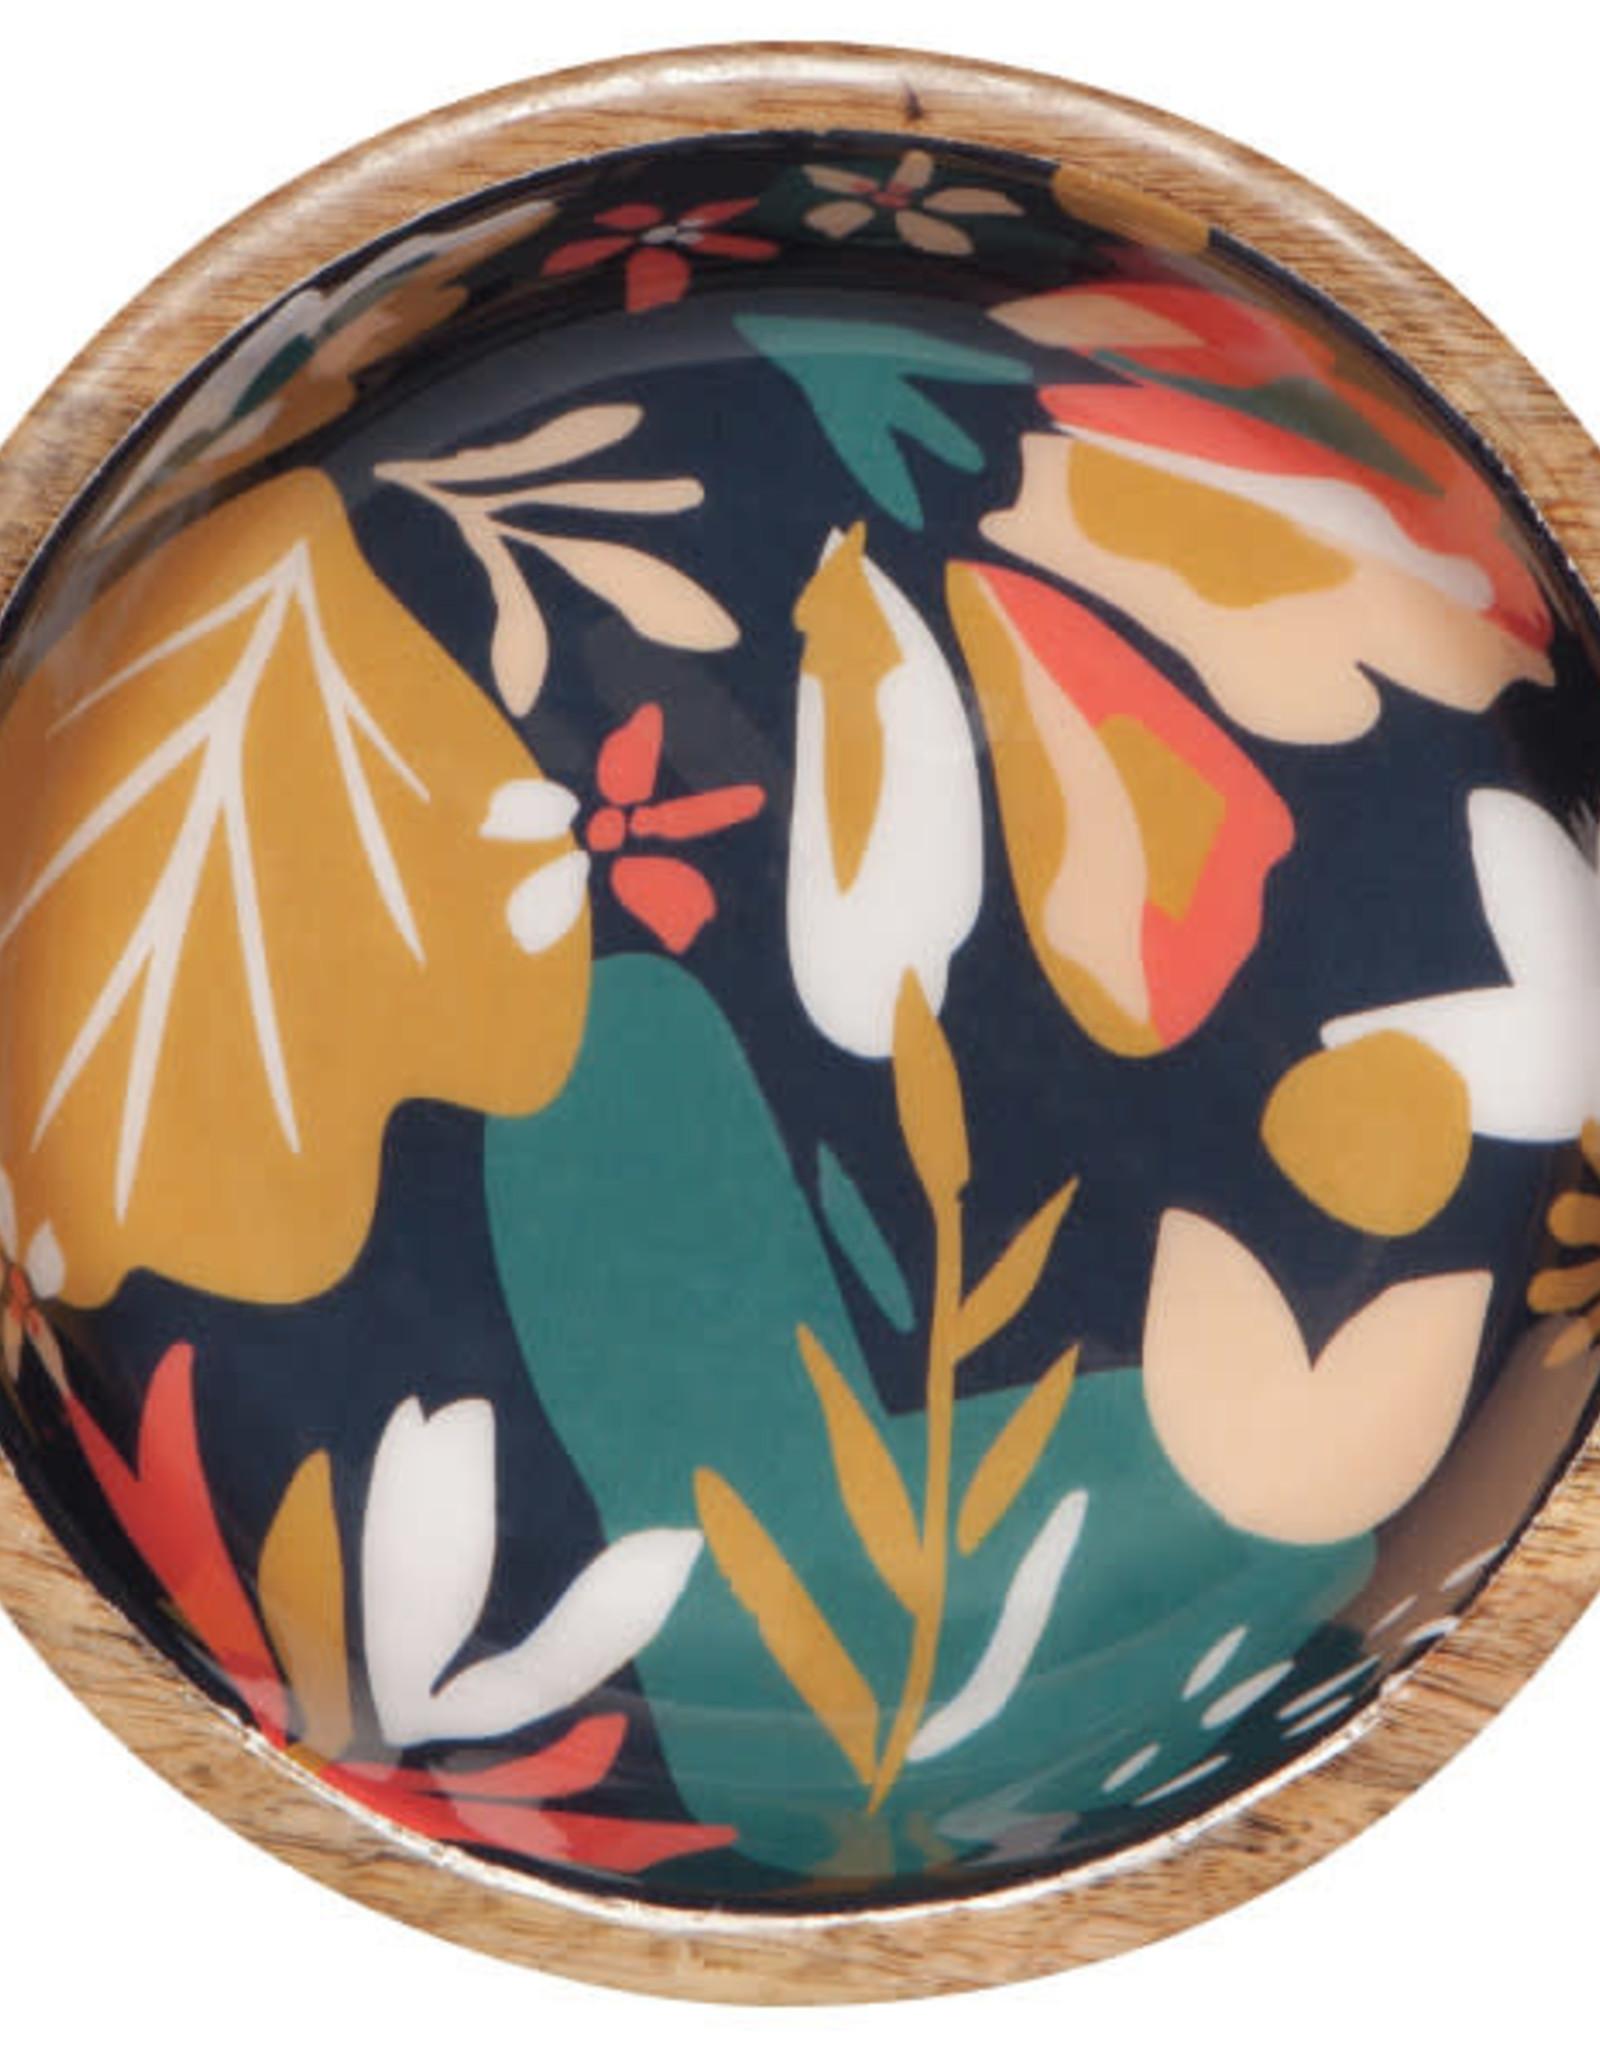 Bol 6'' en bois de manguier - Superbloom